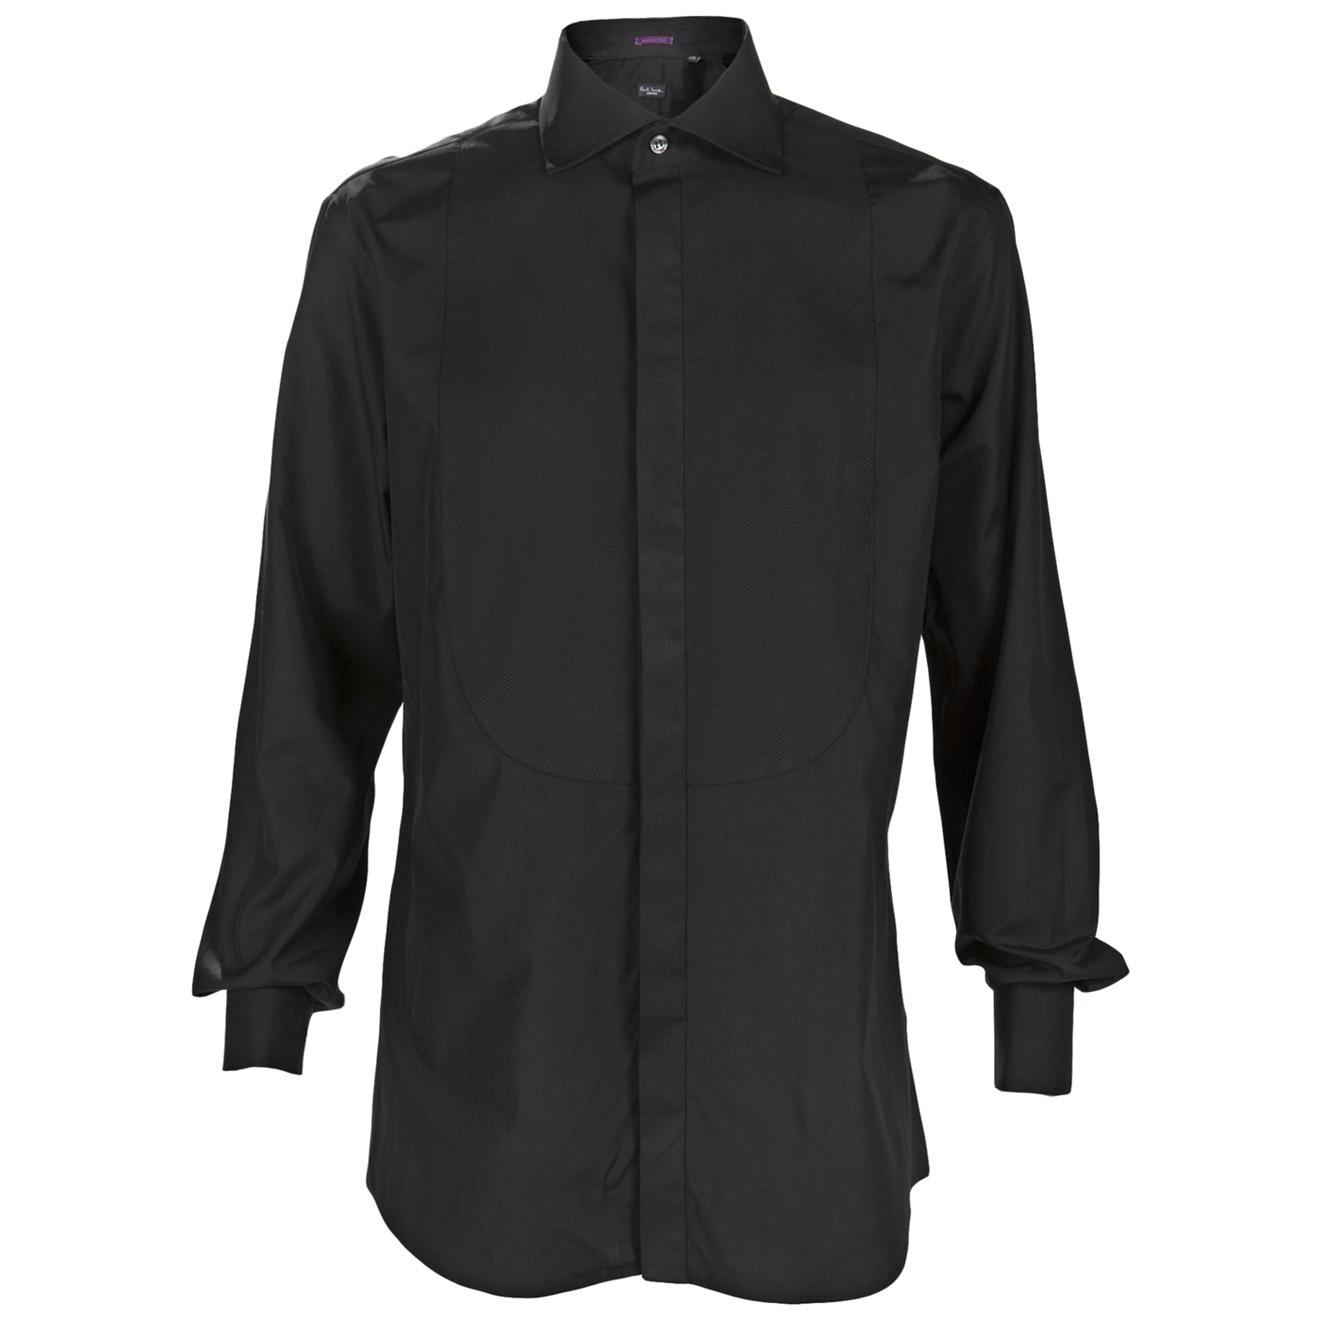 Paul smith french cuff tuxedo shirt in black for men lyst for Tuxedo shirt french cuff